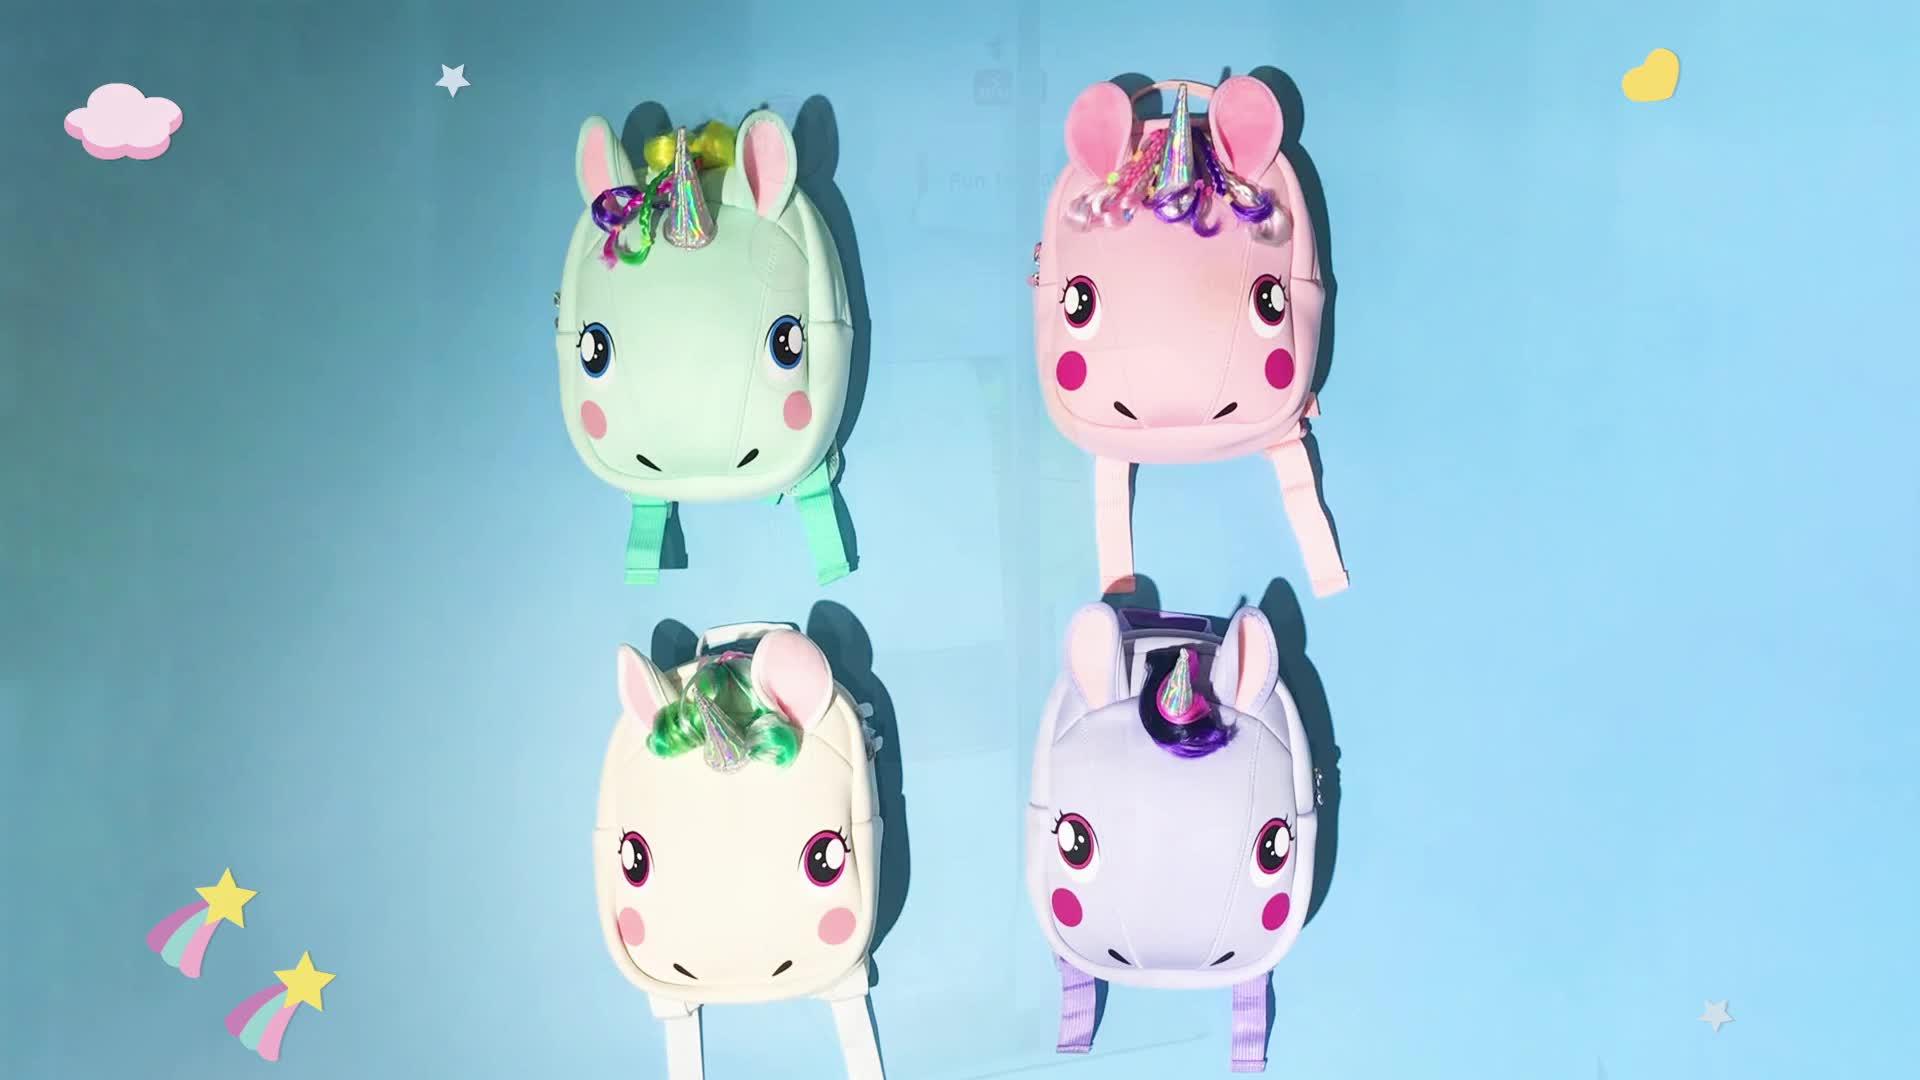 Rucksack unicorn waterproof backpack school back pack, mochilas mini travelling backpack bag, tas girls bagpack hiking backpack